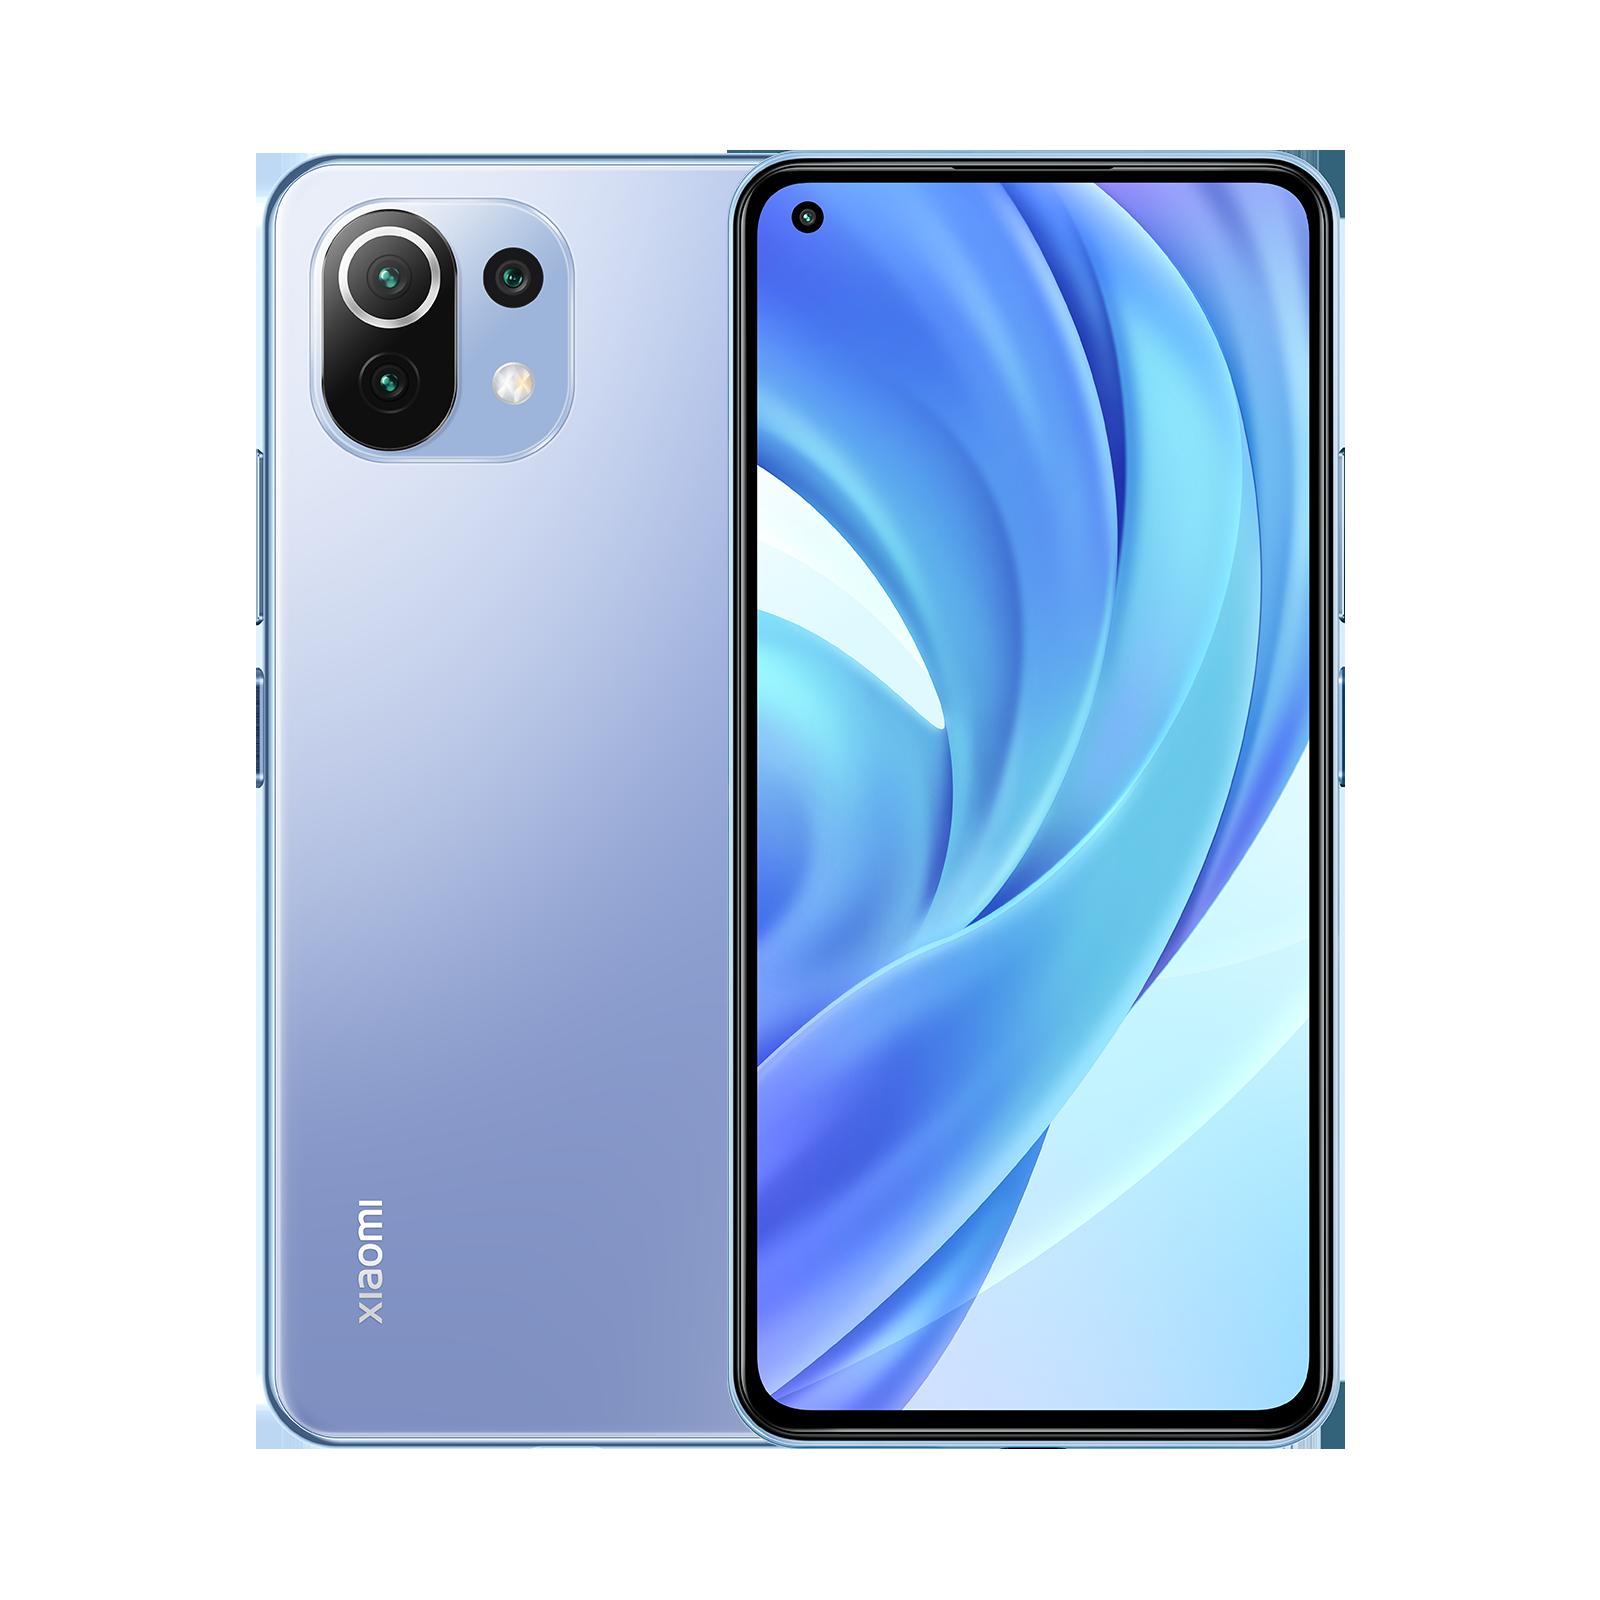 Mi 11 Lite Bubblegum Blue 6GB+128GB | Xiaomi España丨Mi.com